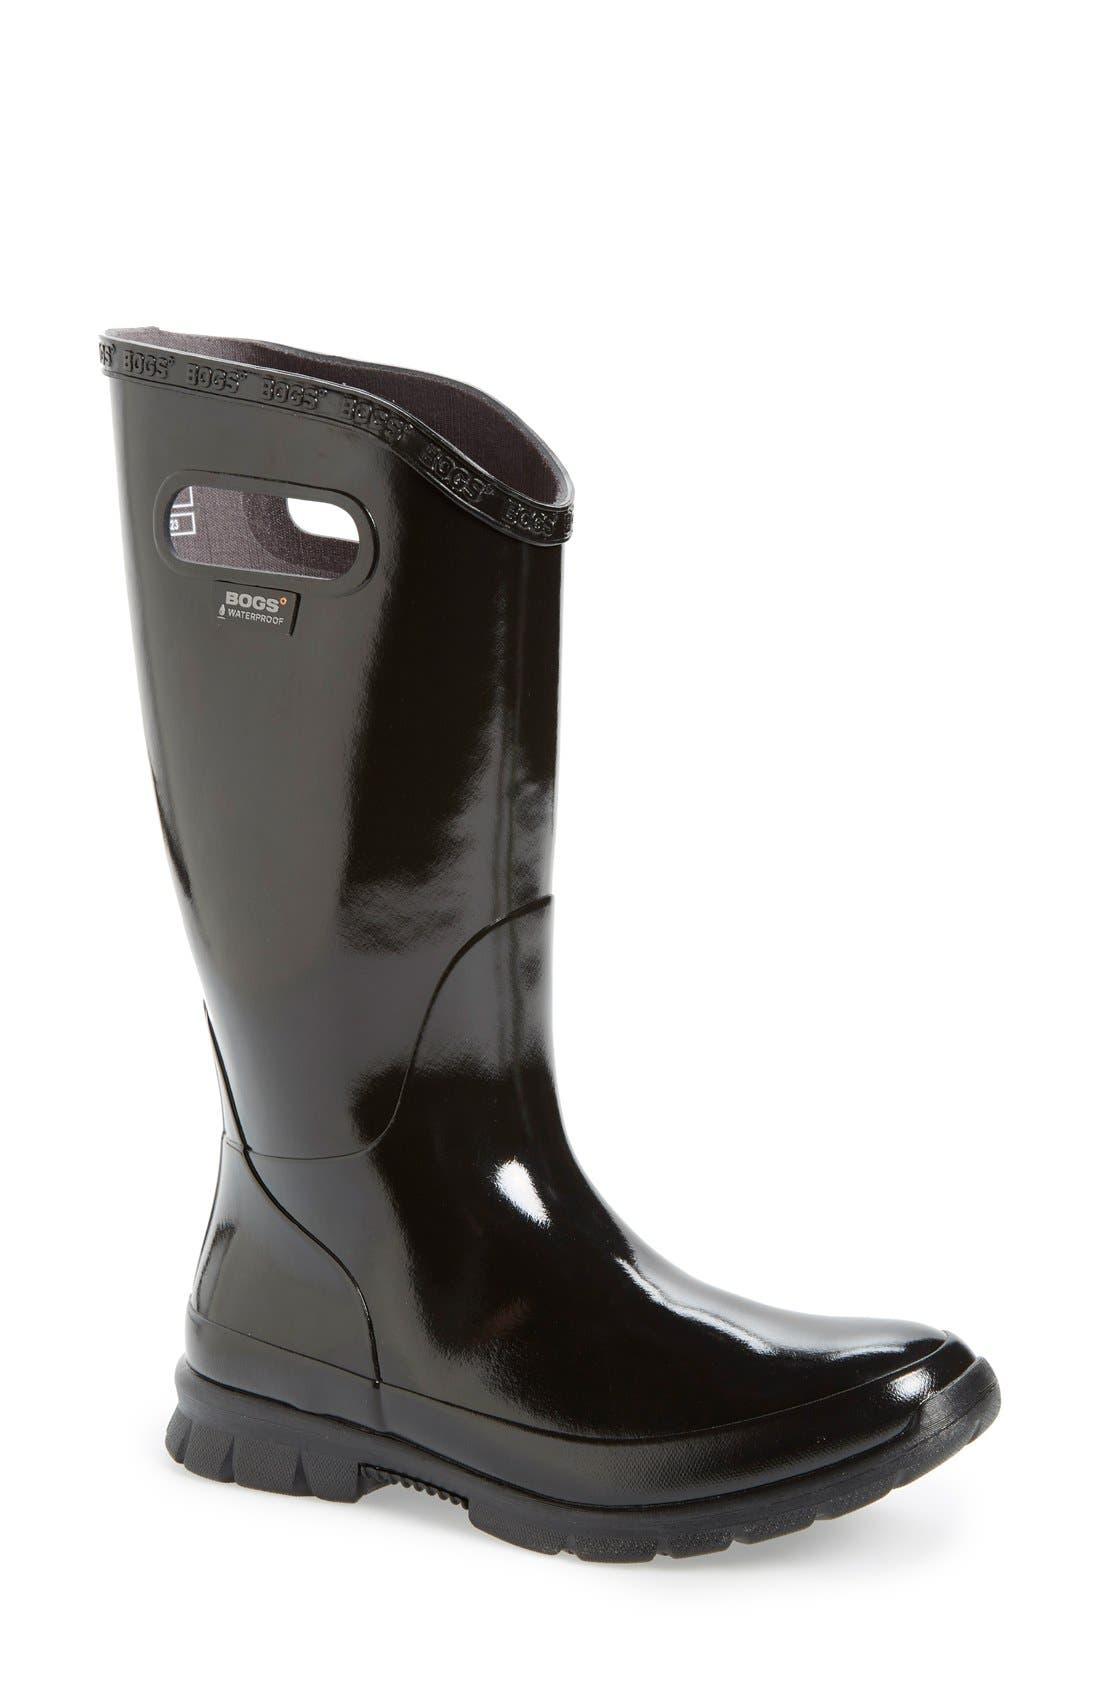 Main Image - Bogs 'Berkley' Waterproof Rain Boot (Women)